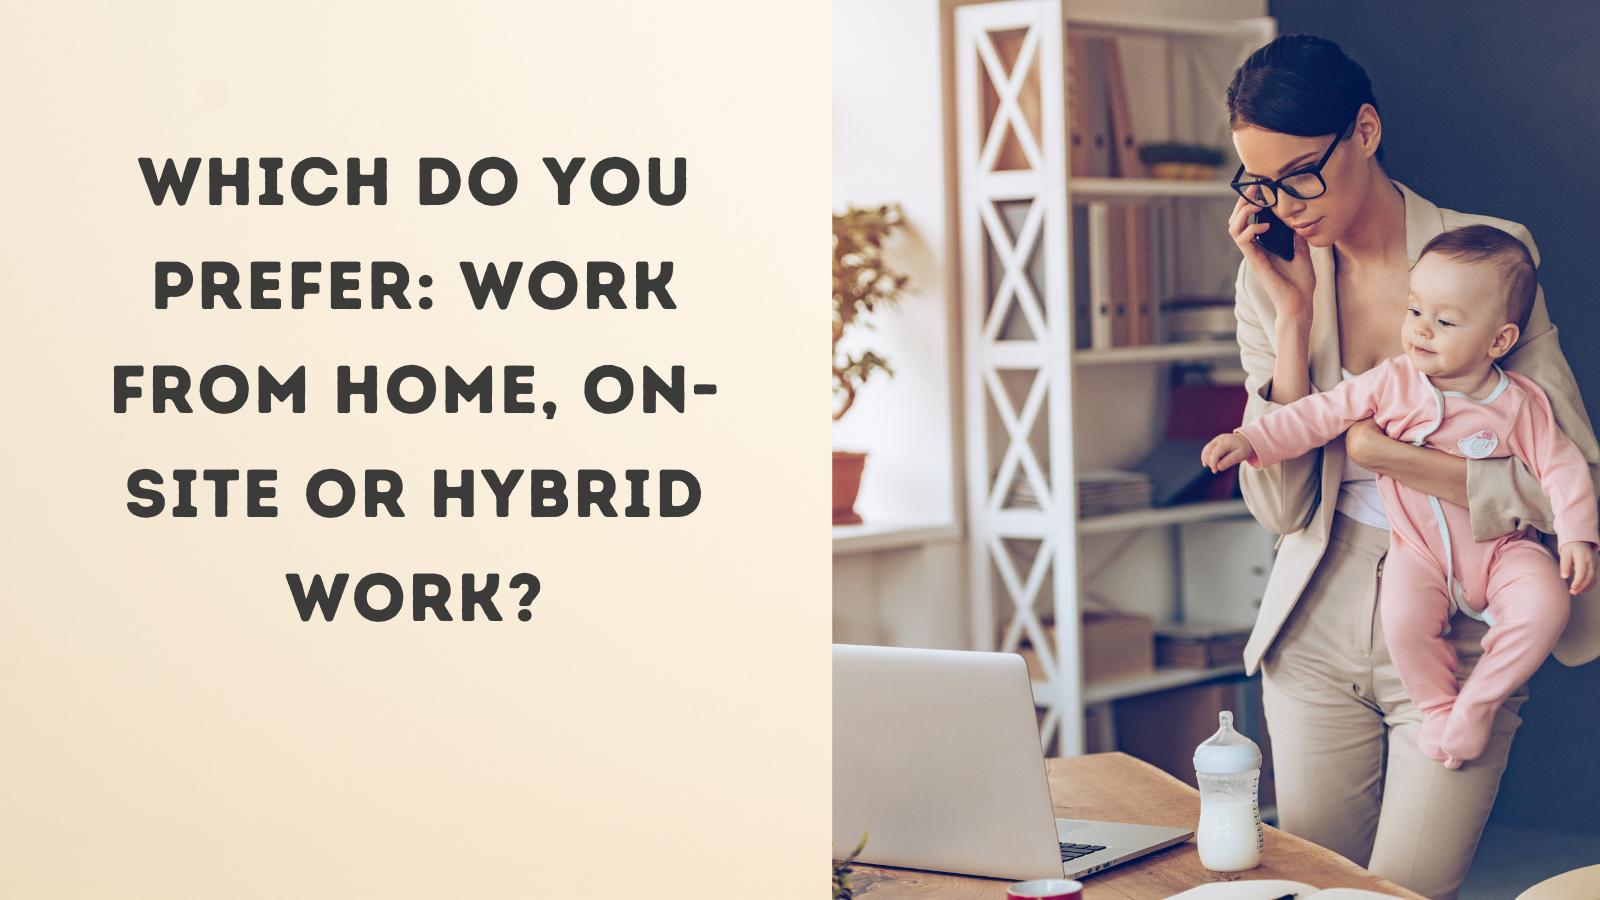 #hybridwork